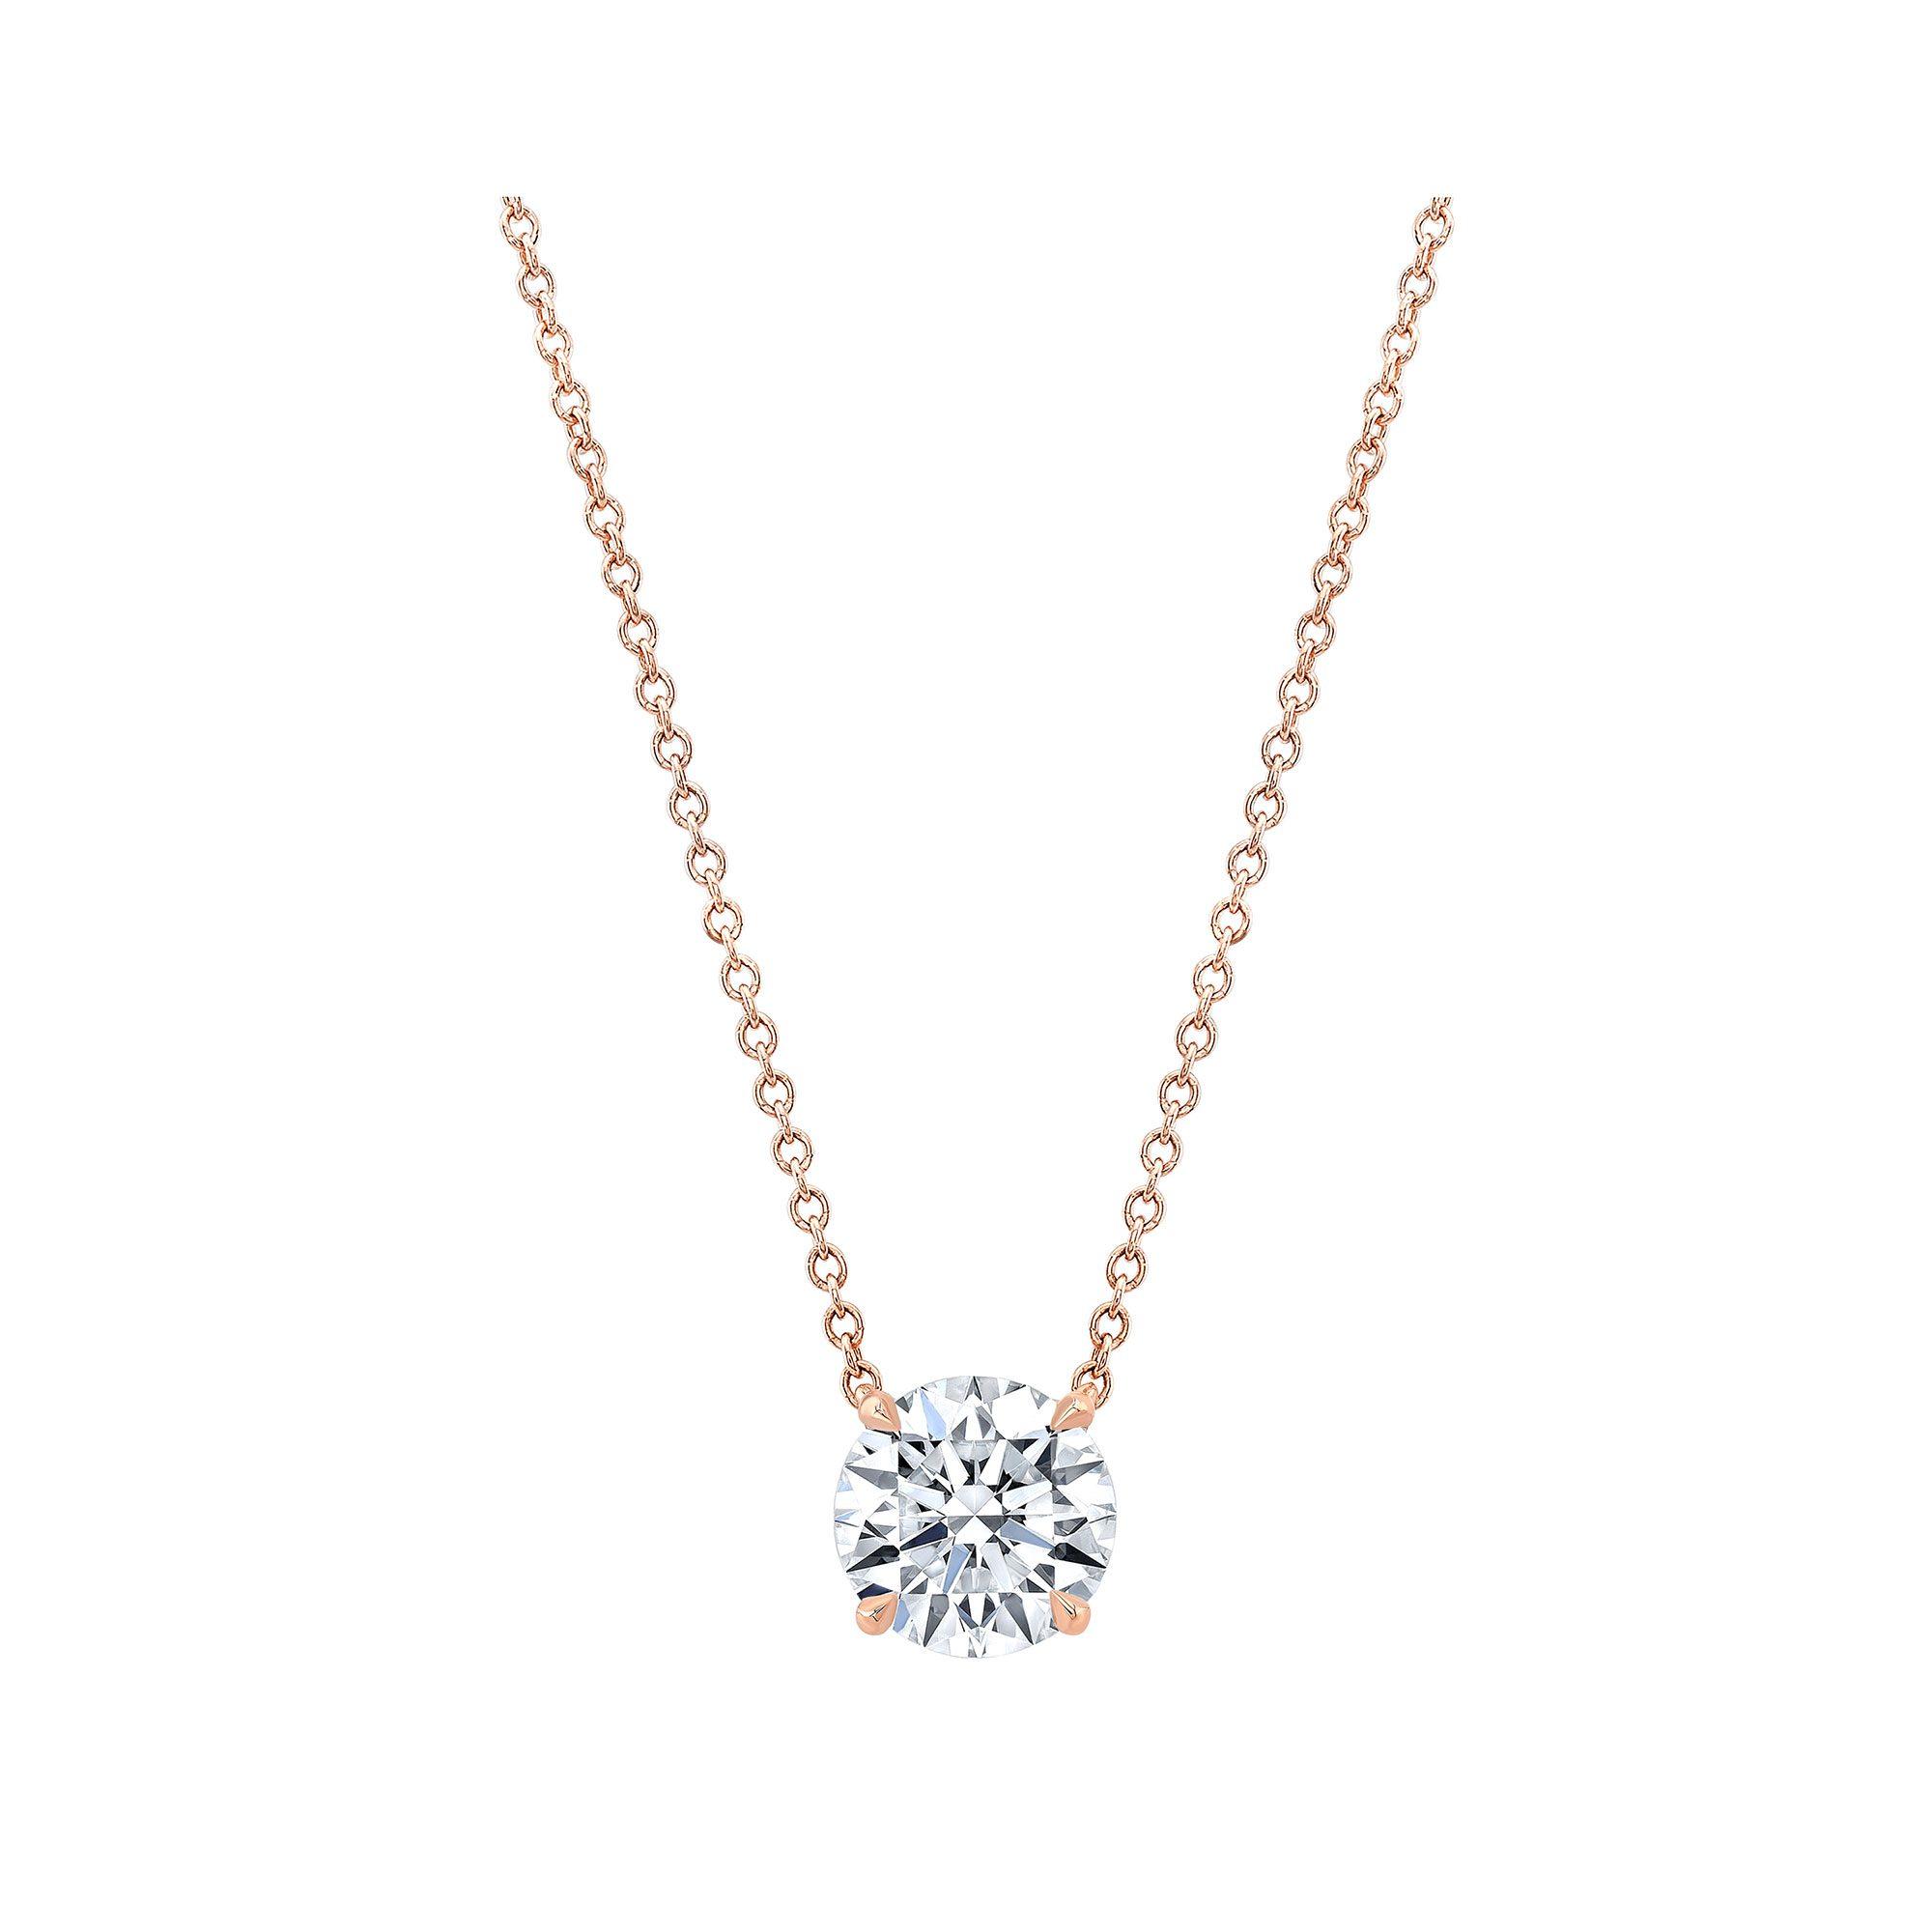 Marie Round Brilliant 2 Carat Lab Grown Diamond Necklace Pendant in Rose Gold